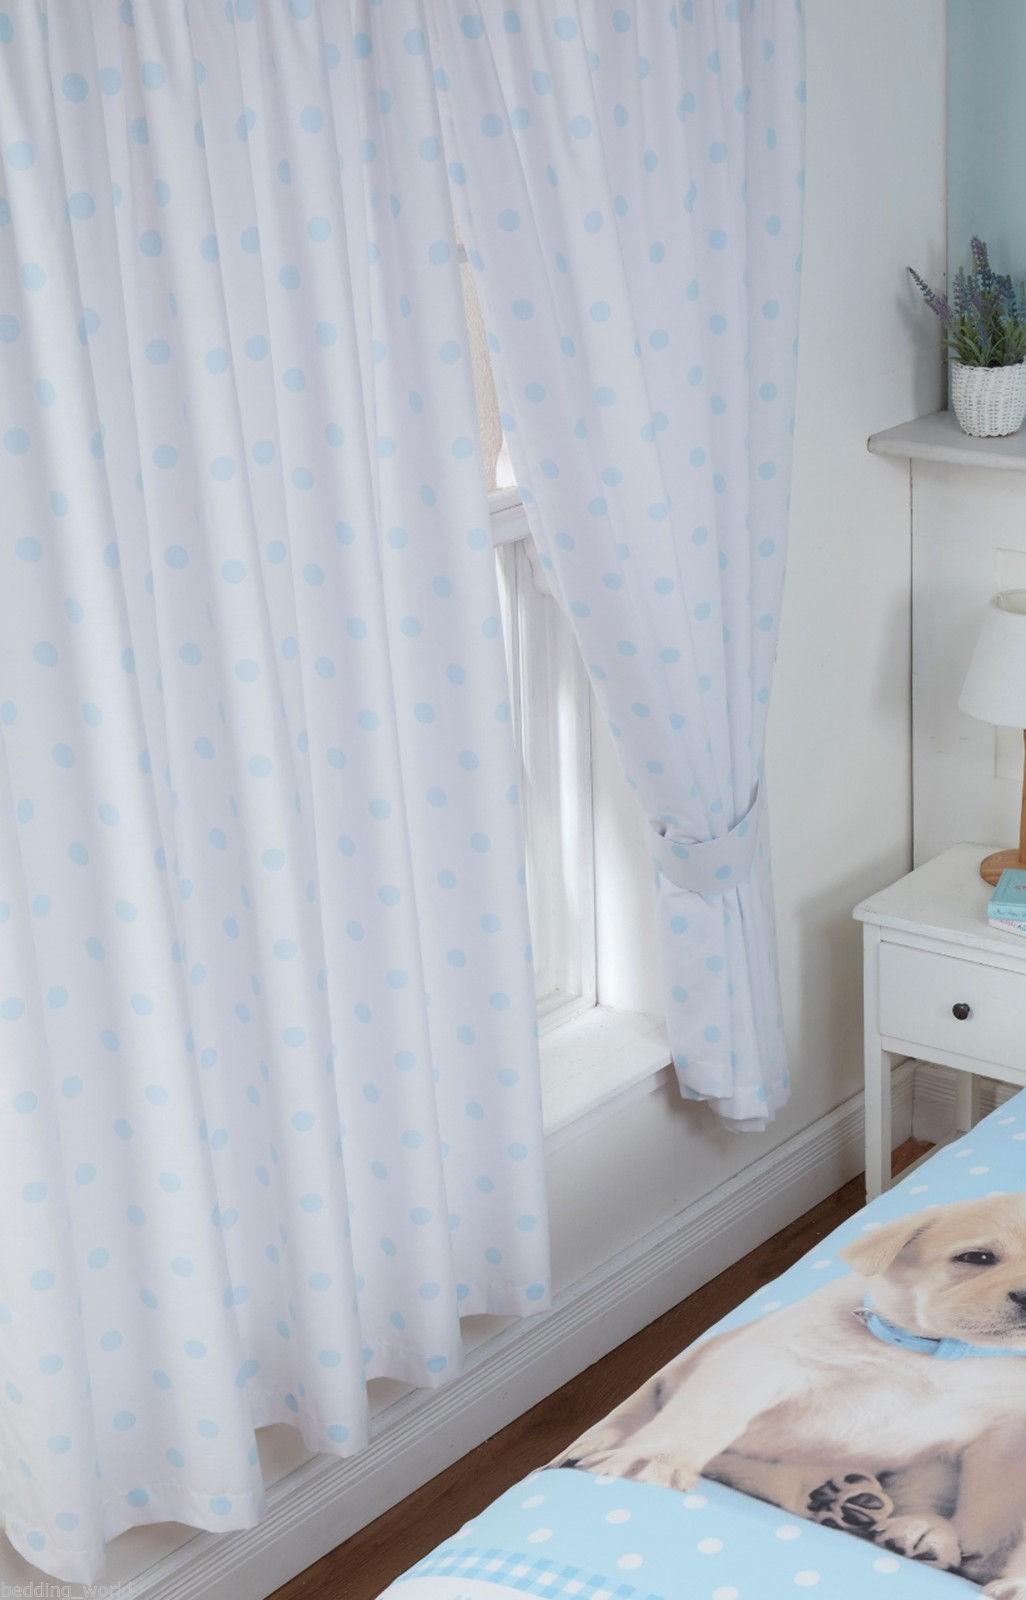 Luke & Leia Cute Labrador Puppy Set Curtains & Tie Backs